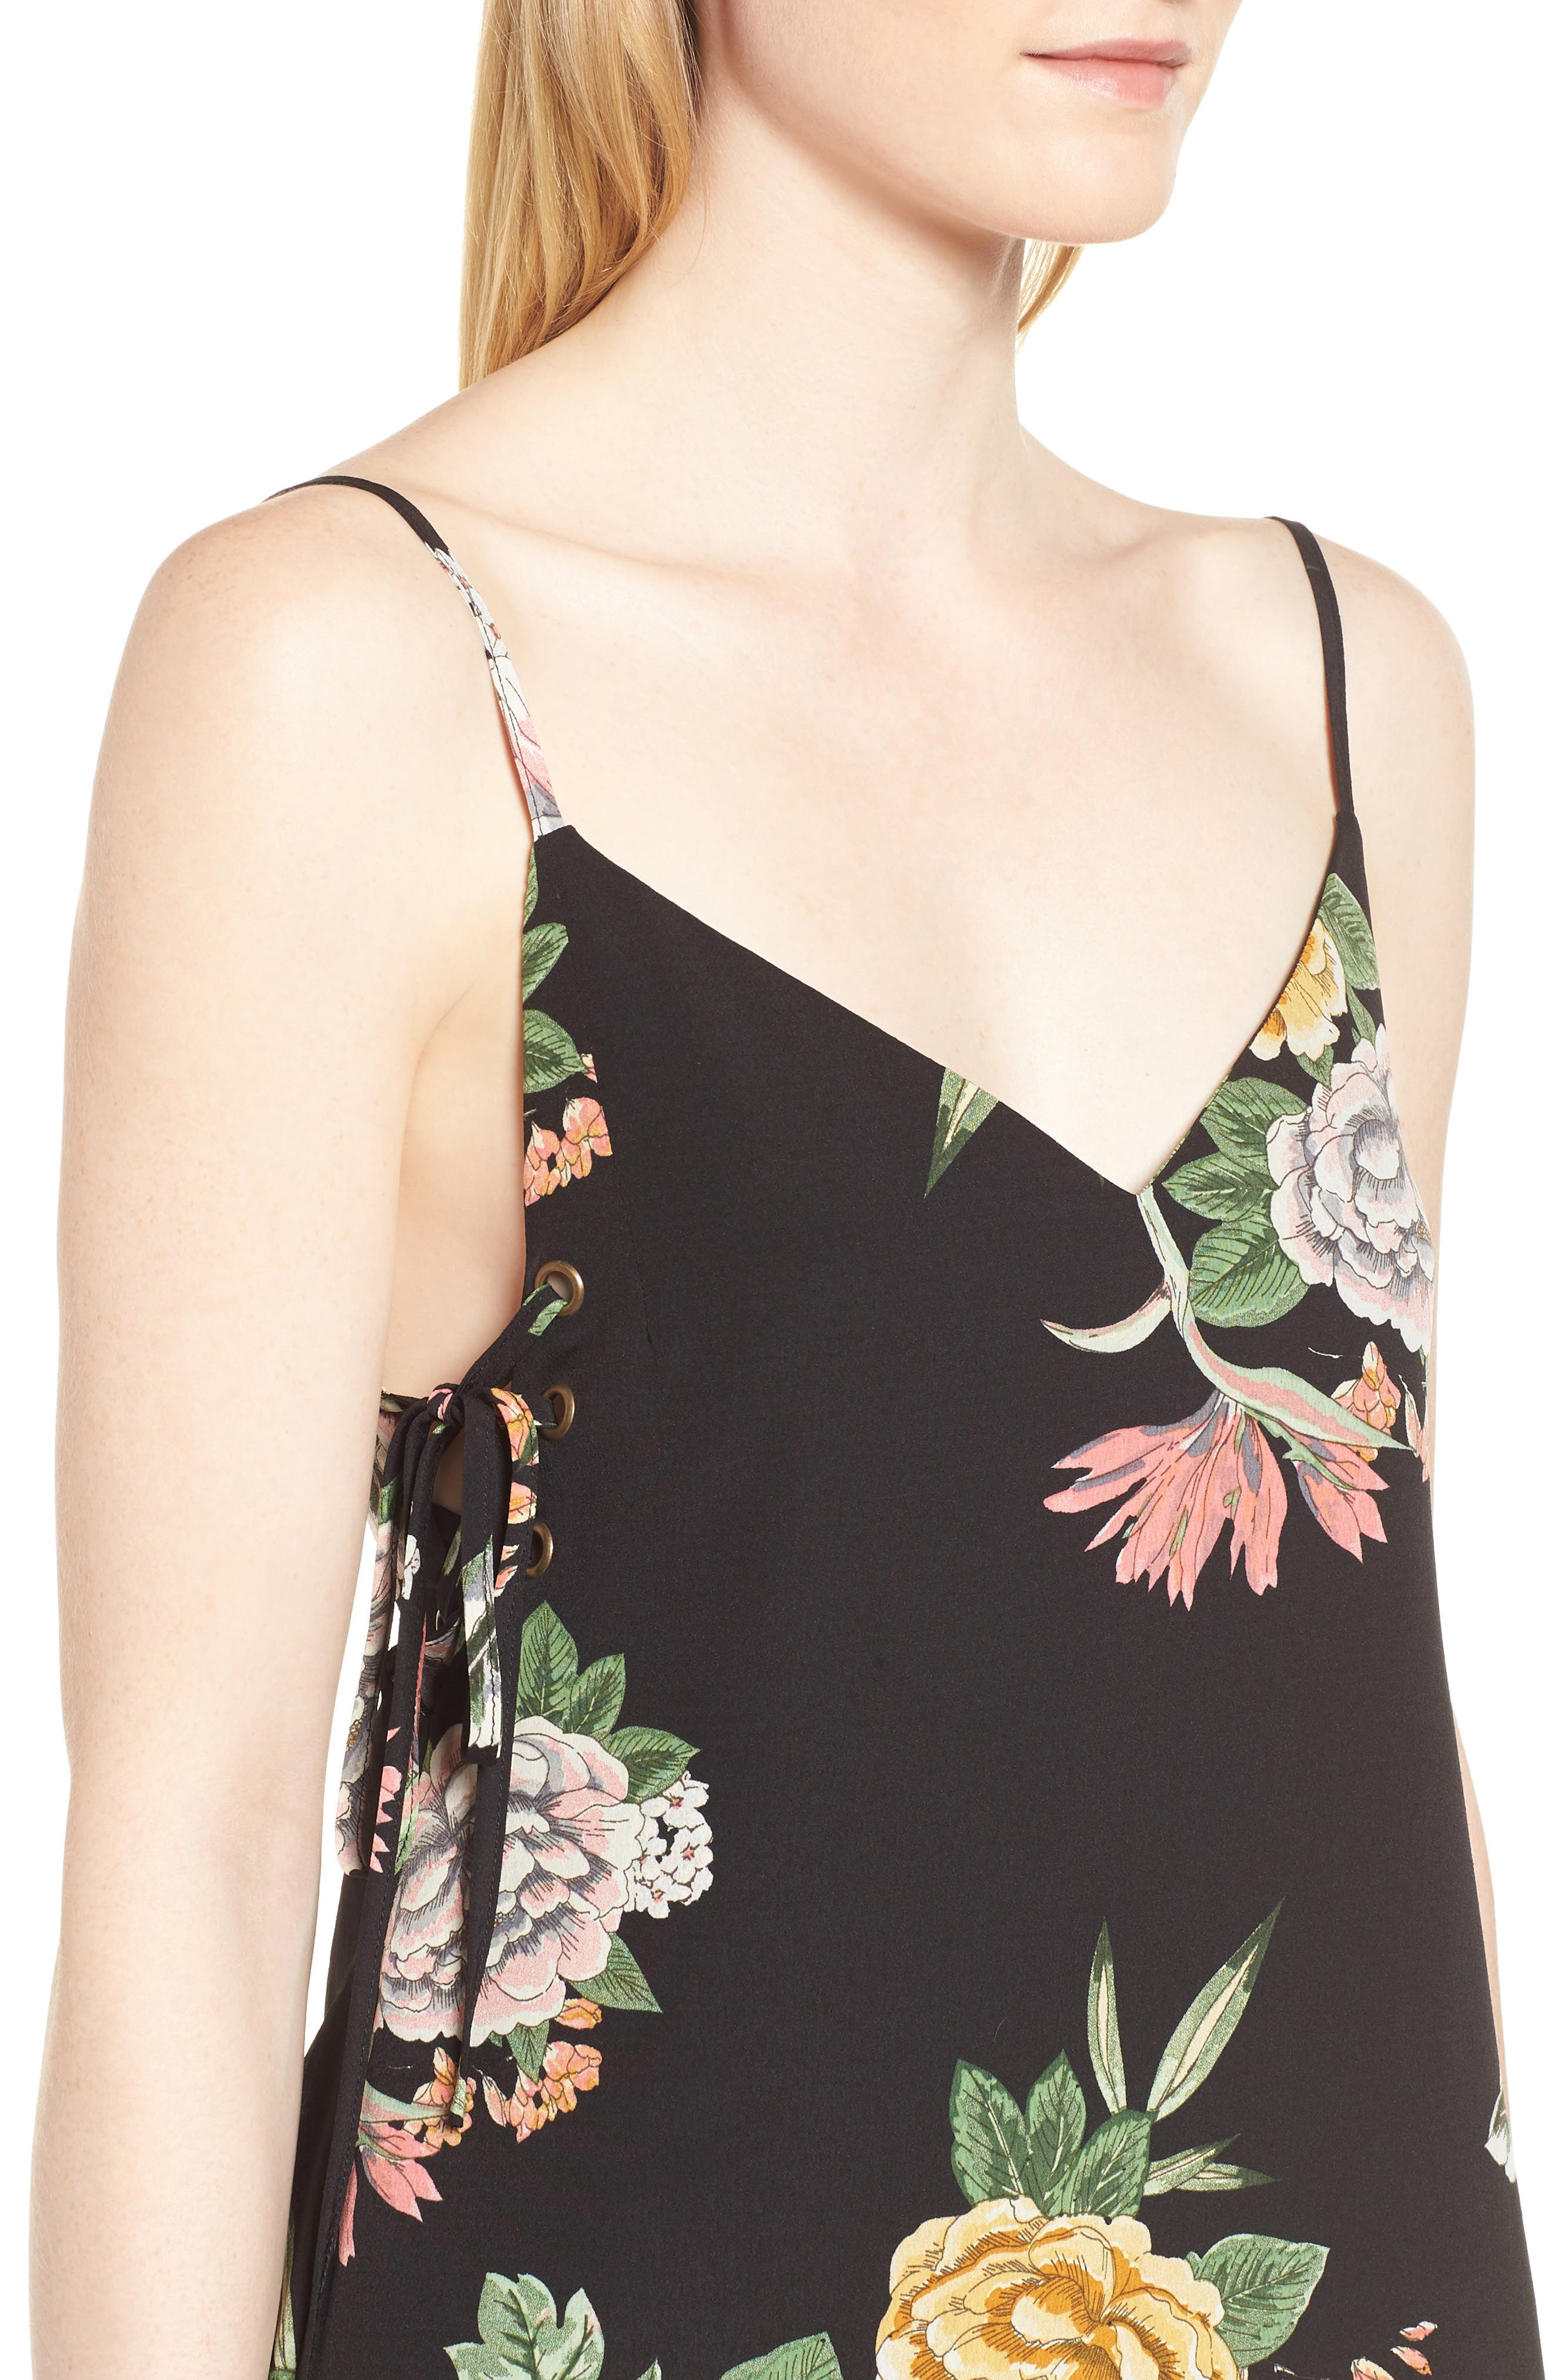 Enchanted Garden Lace-Up Dress,                             Alternate thumbnail 4, color,                             ENCHANTED GARDEN PRINT